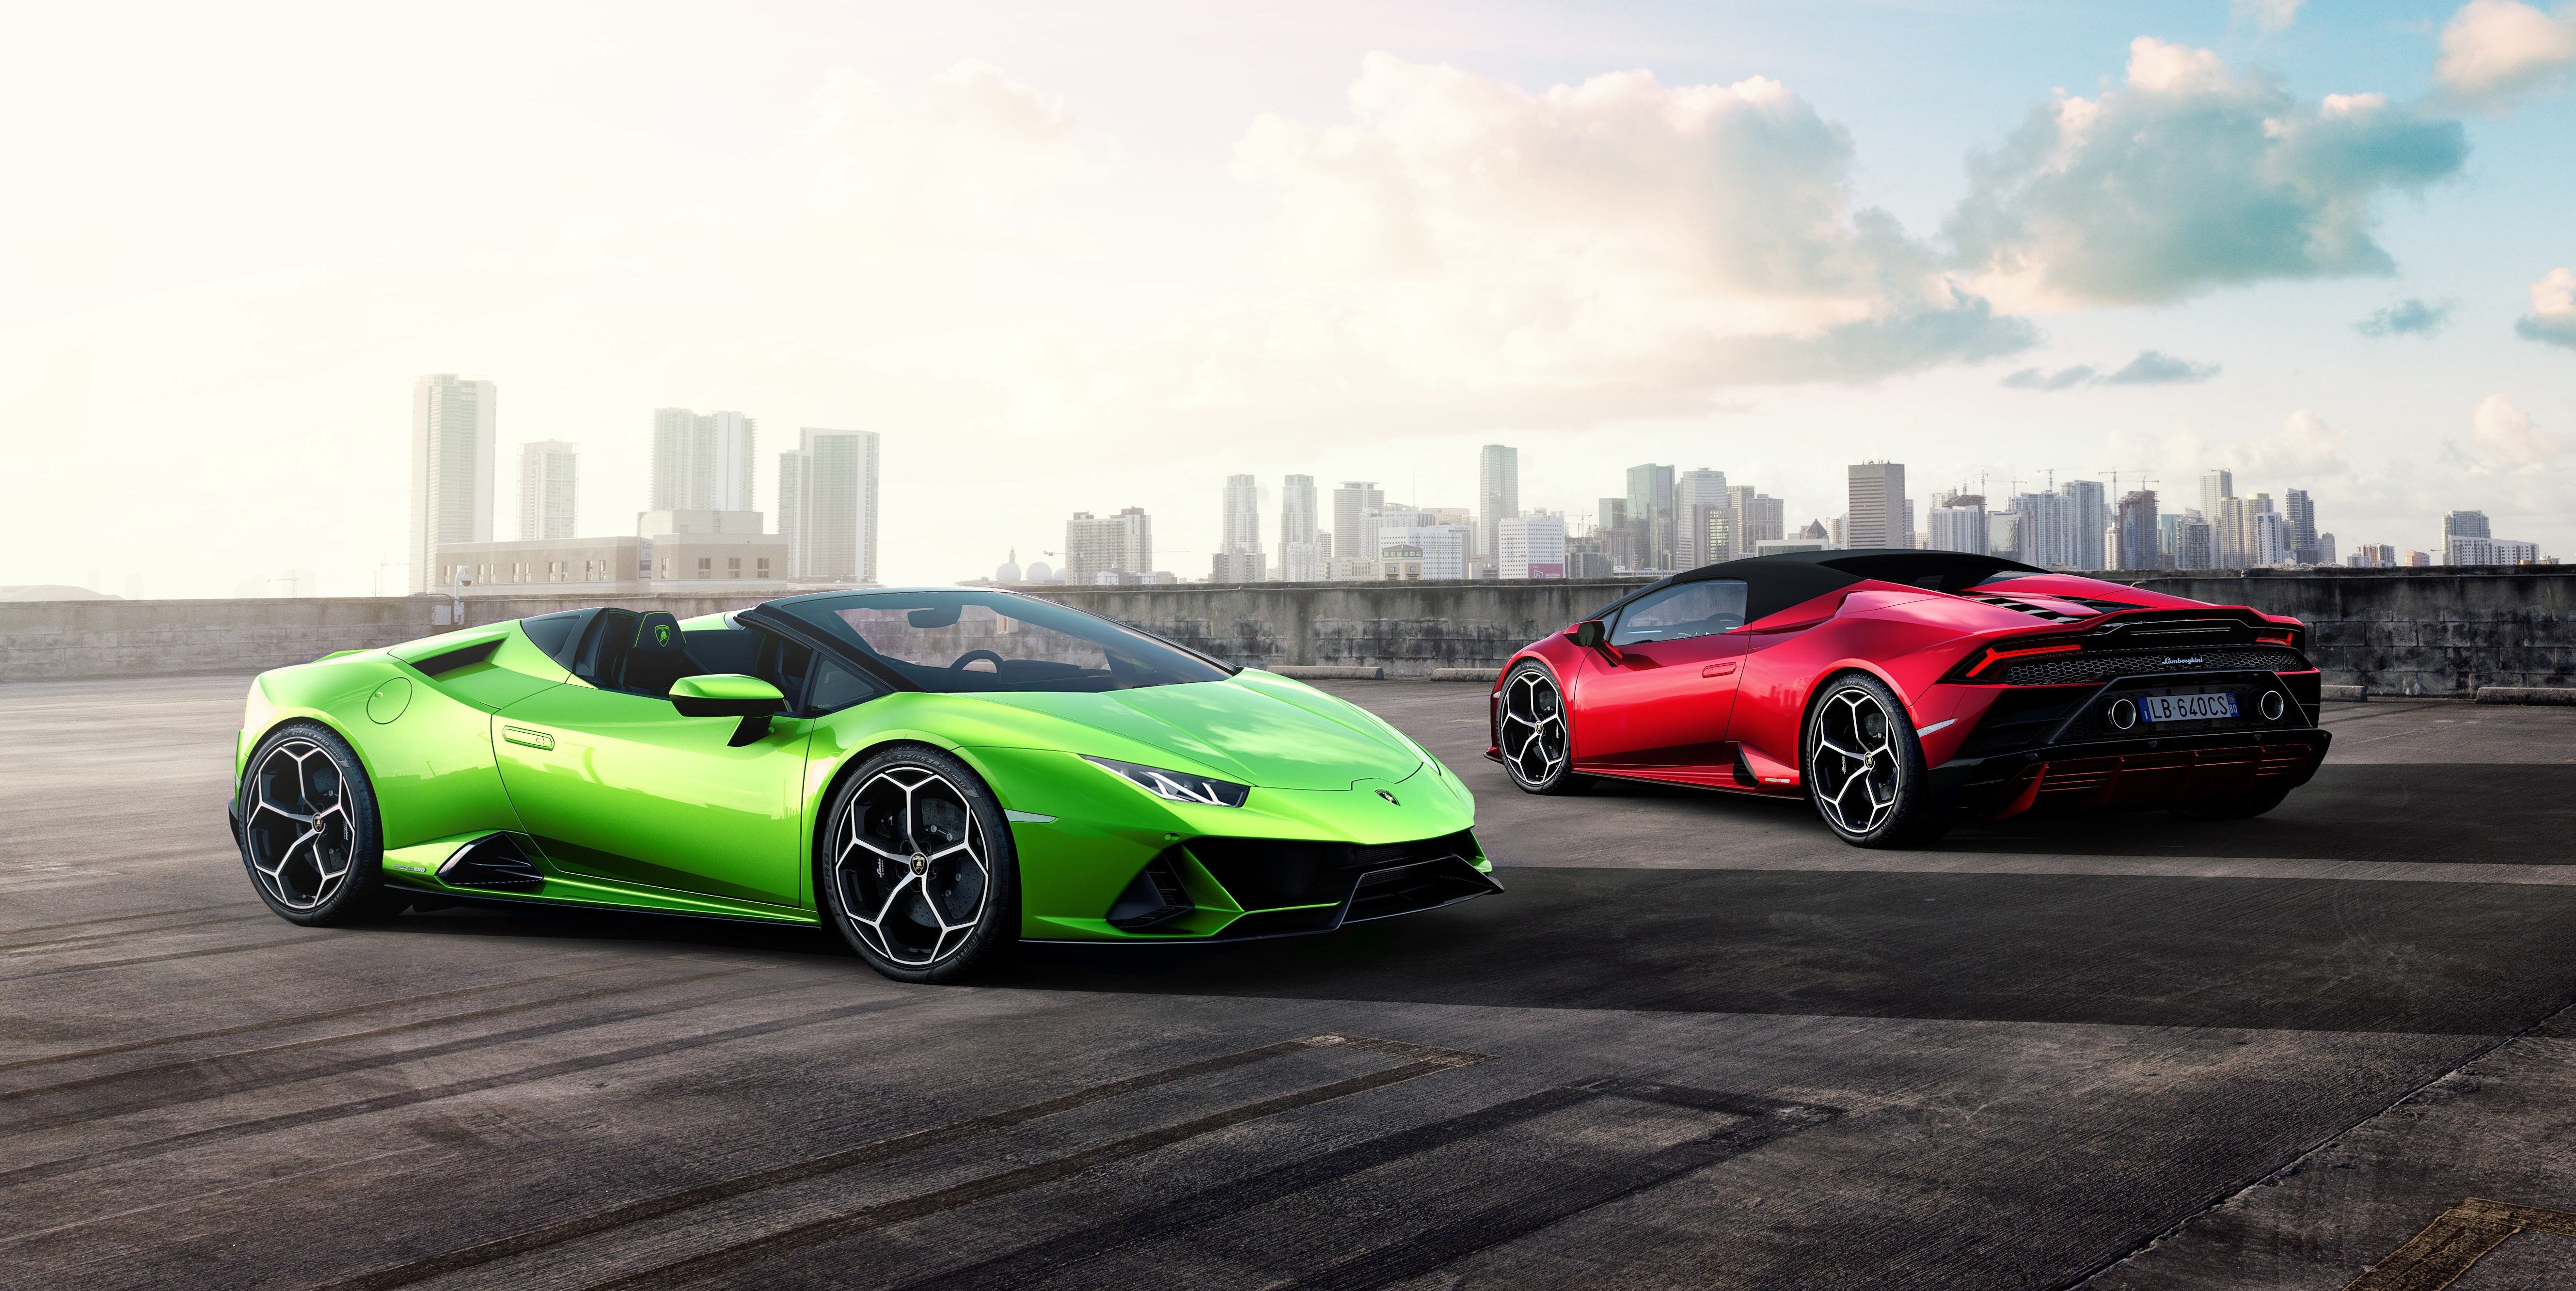 Lamborghini Huracan Evo Spyder Open Air Fun And 202 Mph